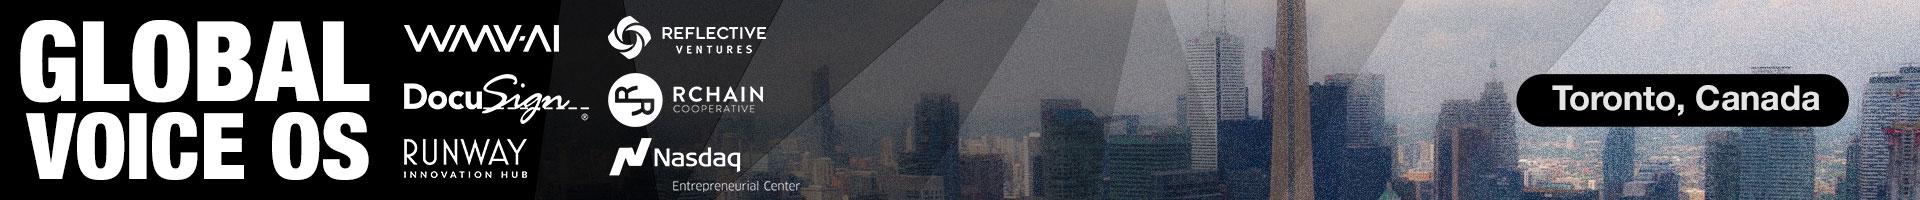 Event-Global-Voice-OS-1920x200-Toronto-Canada